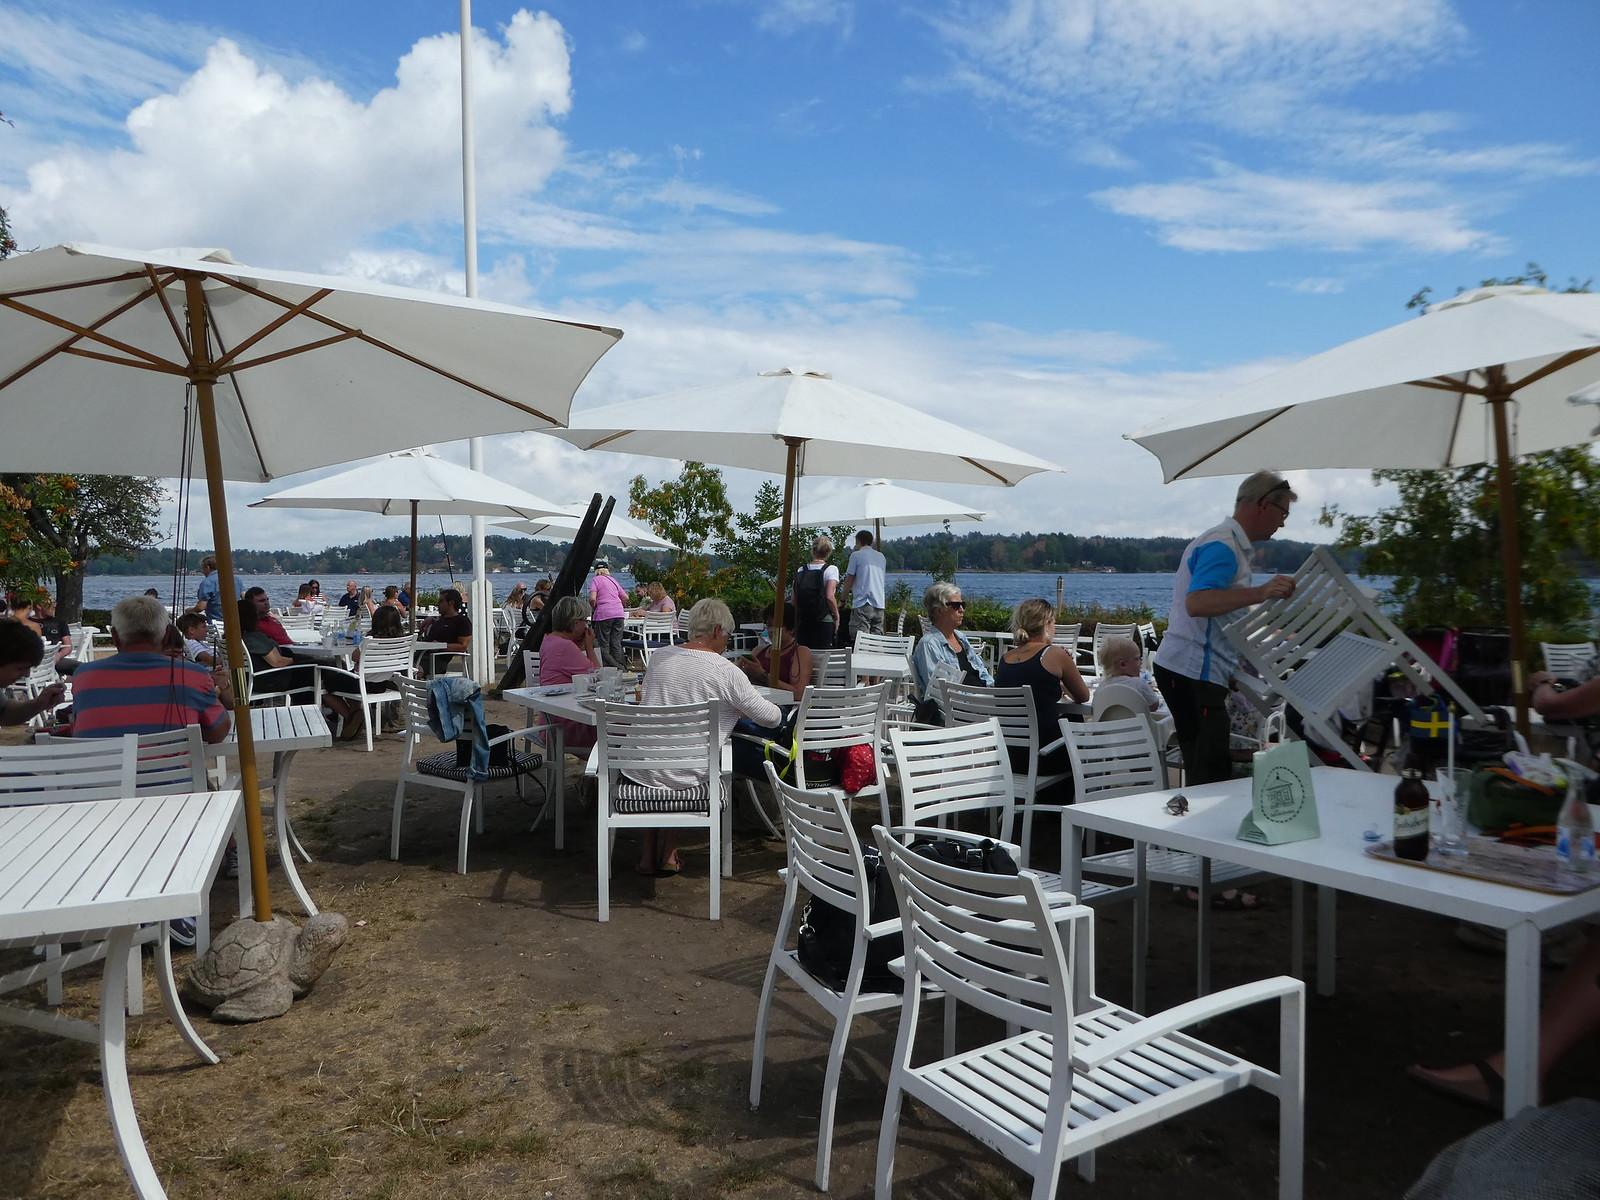 Hembygdsgårds cafe, Vaxholm Island, Stockholm